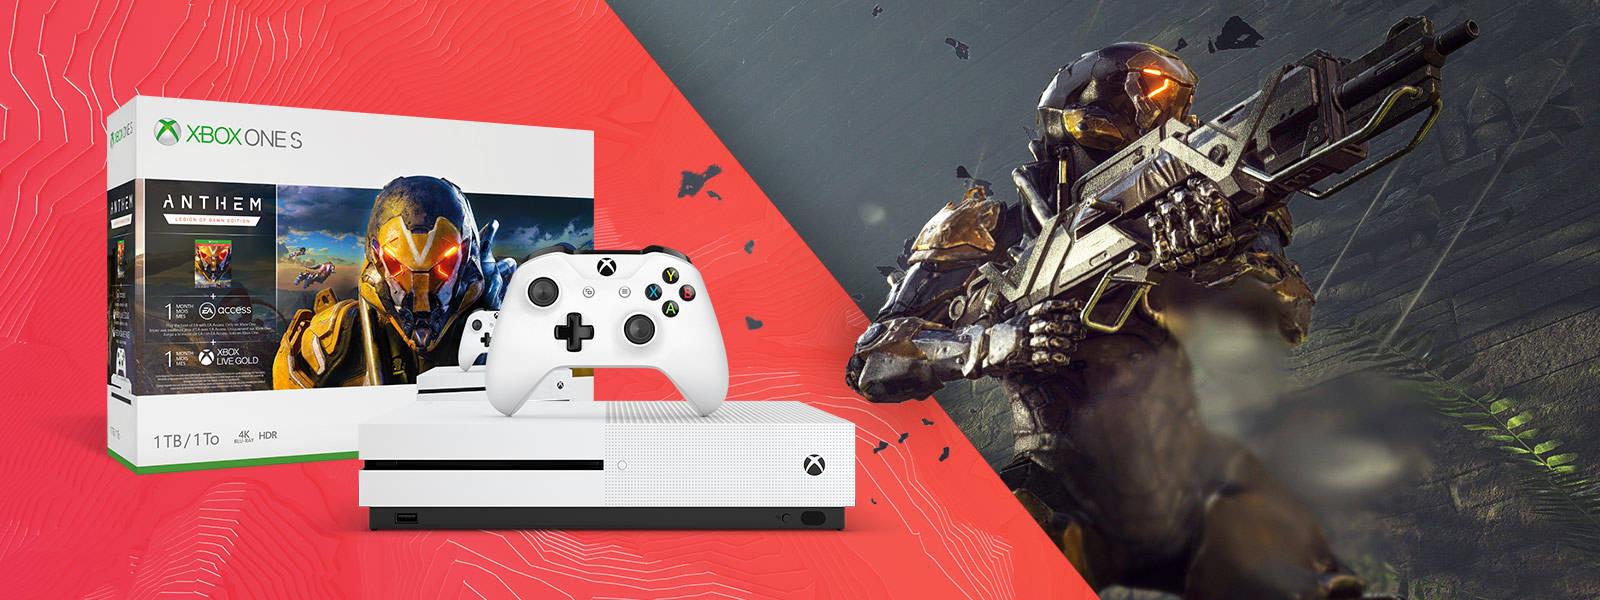 Xbox offerta Anthem